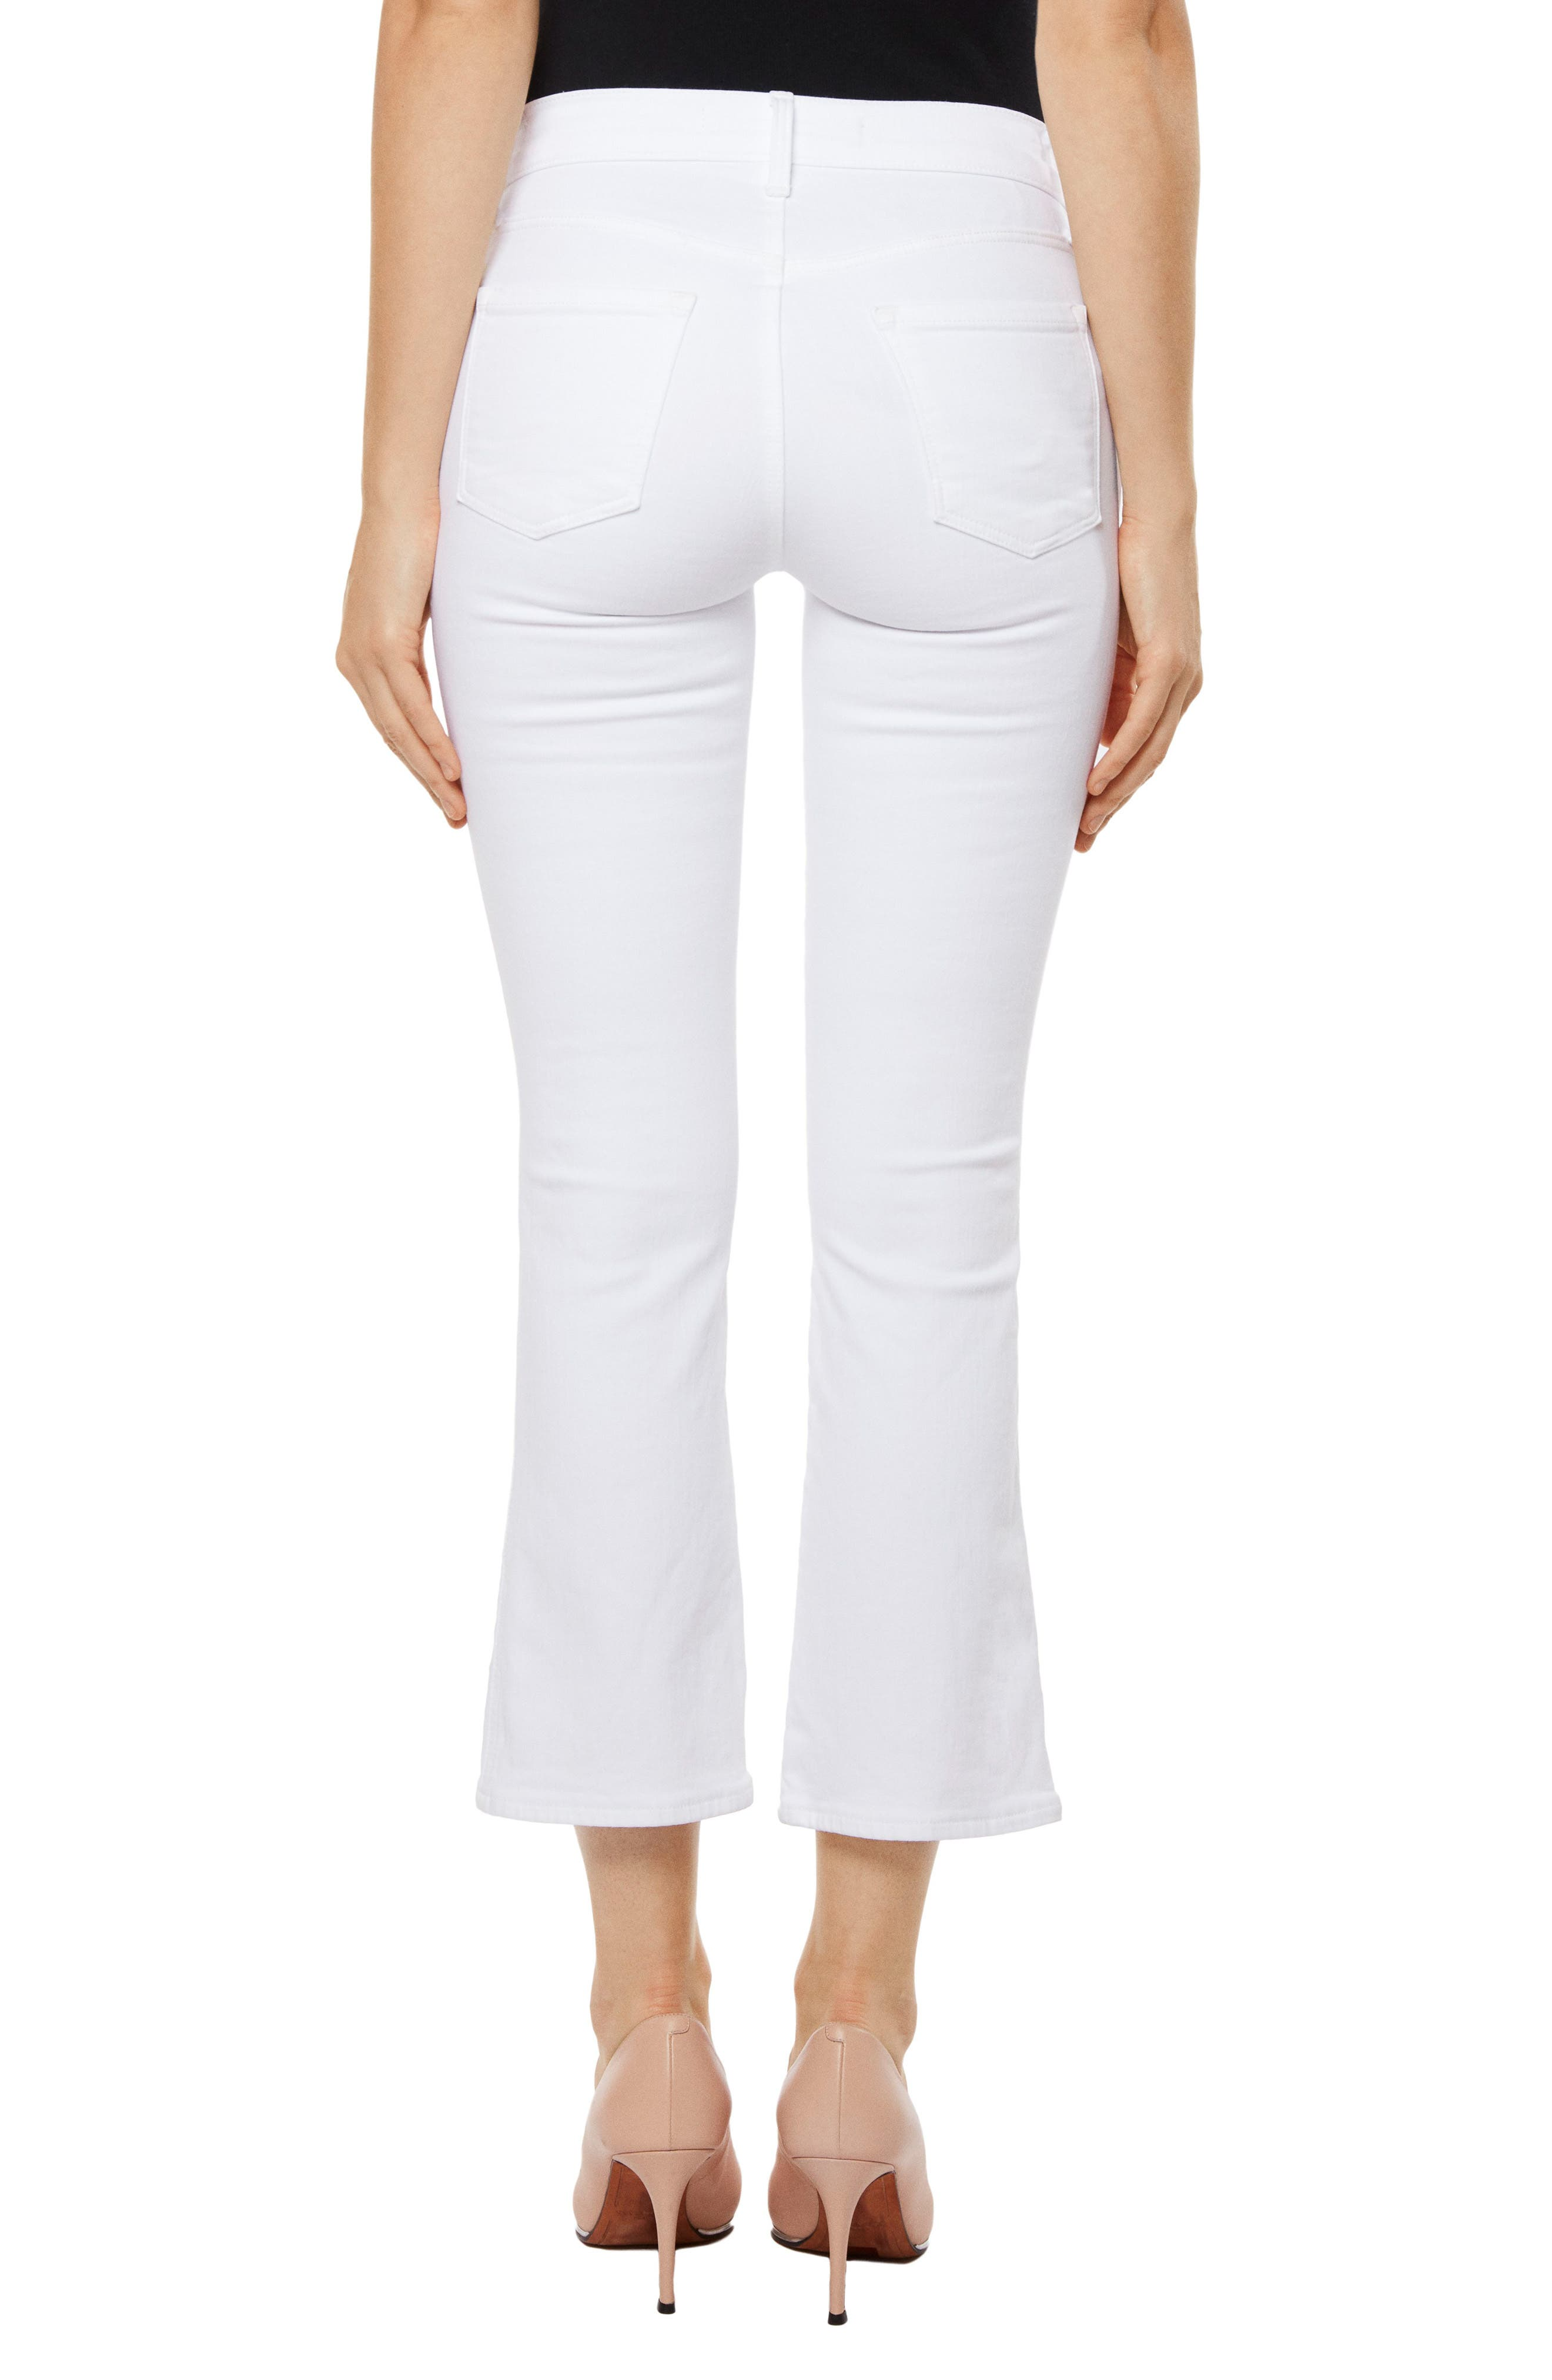 Zion Crop Flare Jeans,                             Alternate thumbnail 2, color,                             161